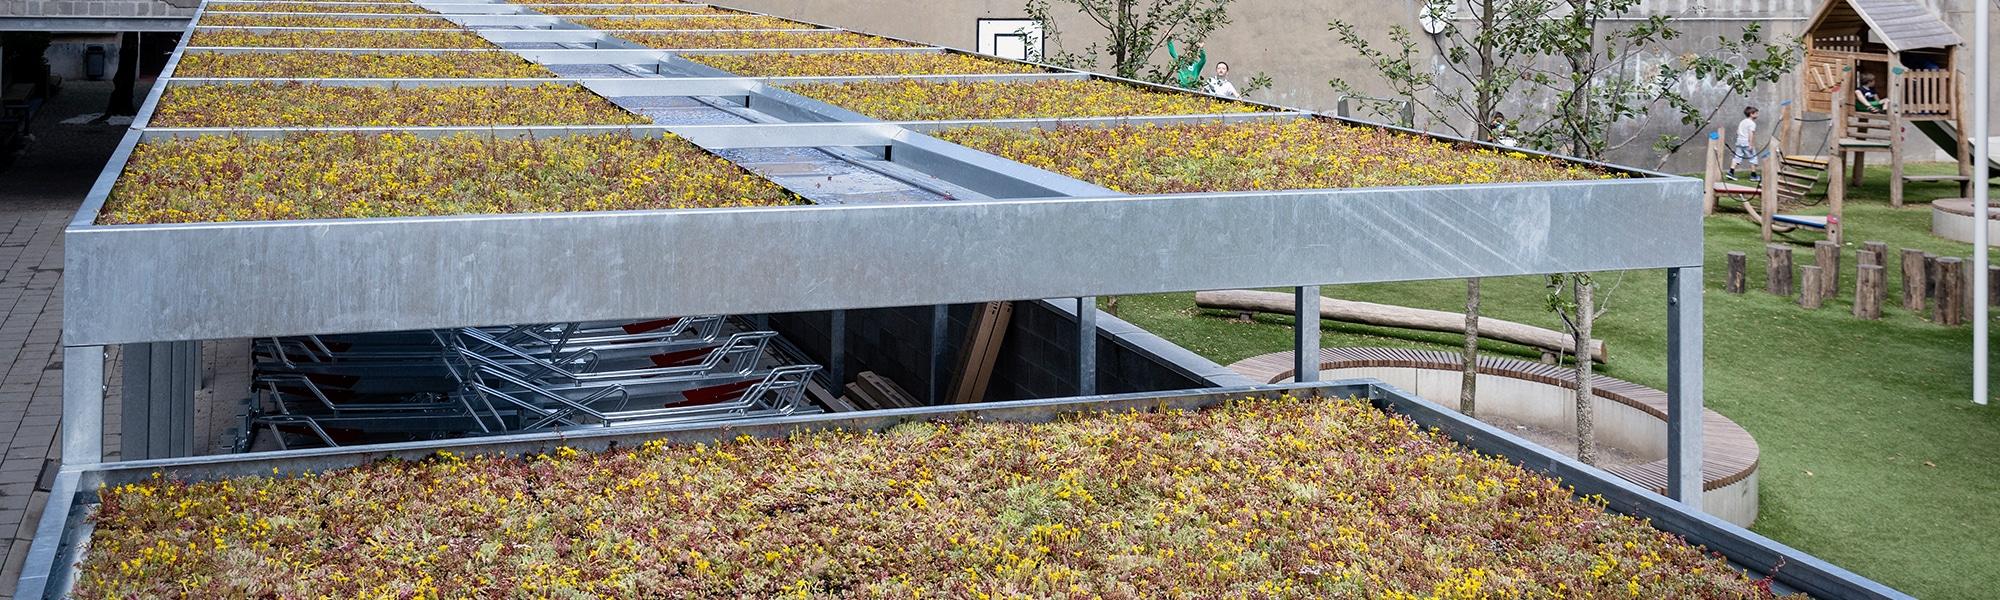 Mobilane Groene daken op Fietsoverkappingen